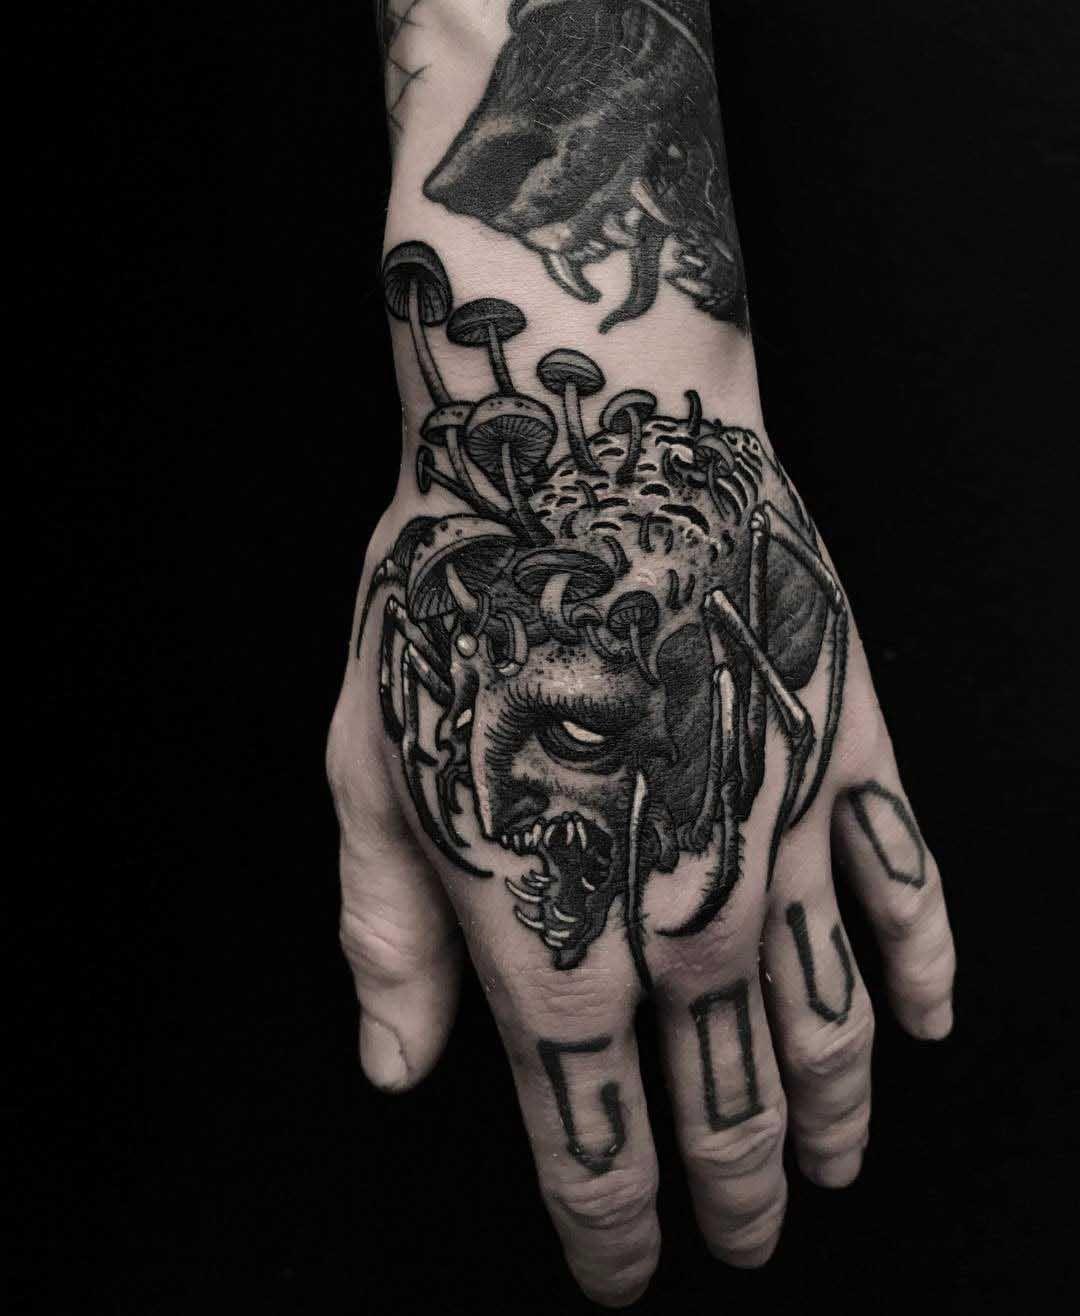 60 Krampus Tattoos For Men – Dark Companion Of Saint Nicholas Design Ideas forecast